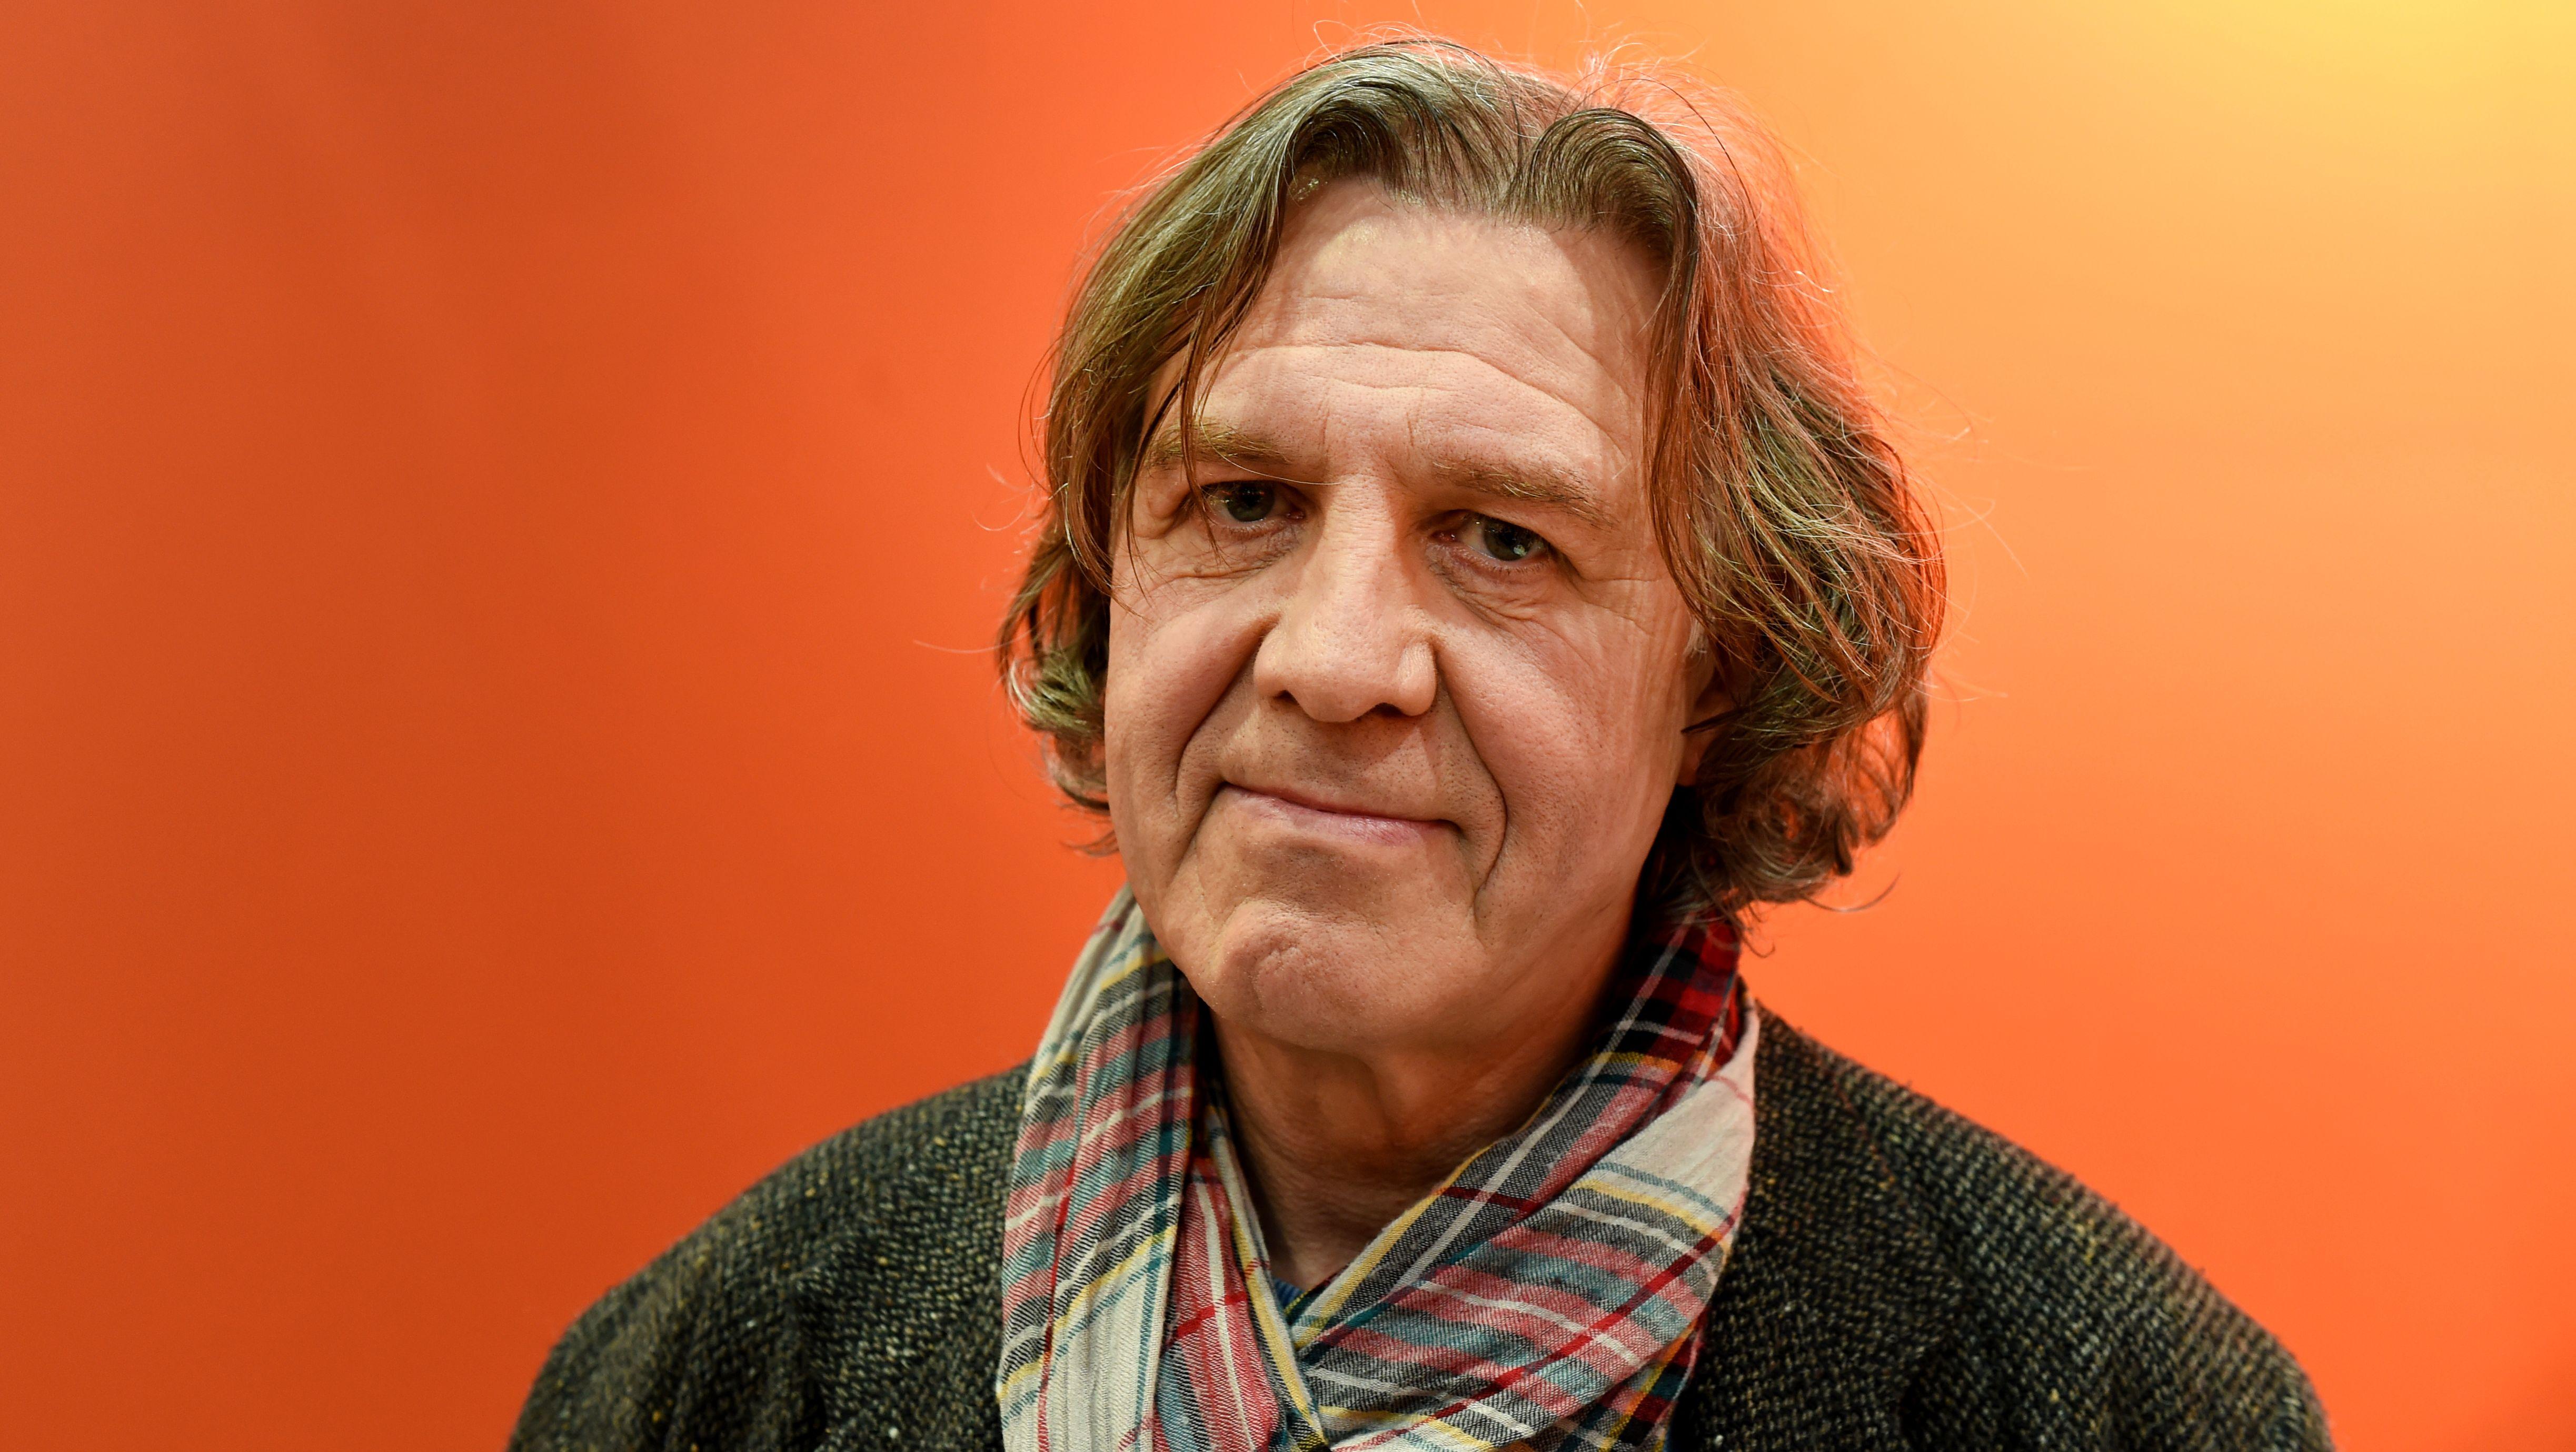 Schriftsteller Norbert Scheuer blickt in die Kamera